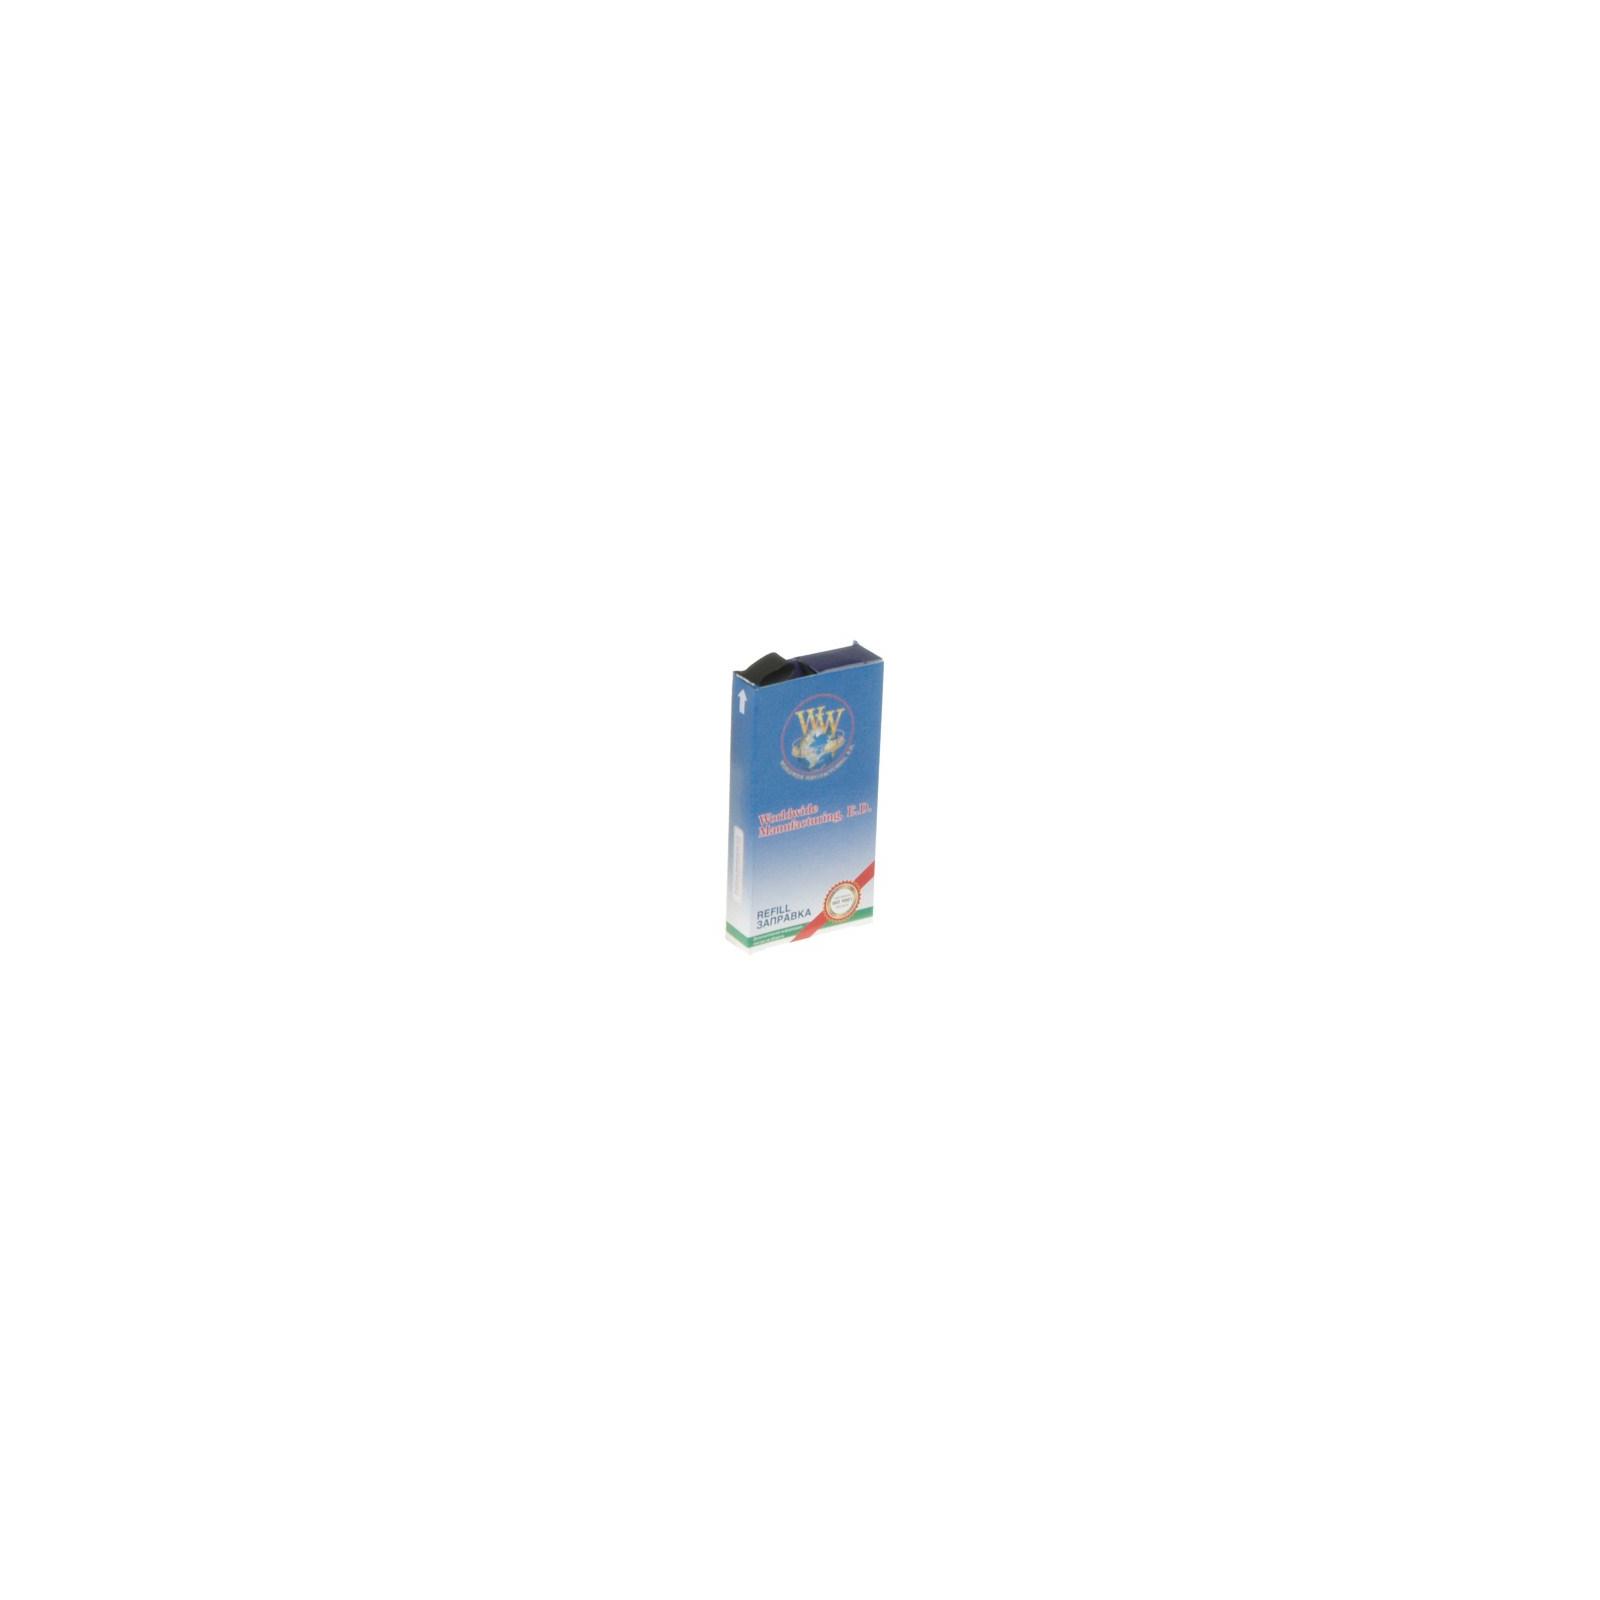 Лента к принтерам 13мм х 16м Black (п.м.) WWM (R.13.16SR)